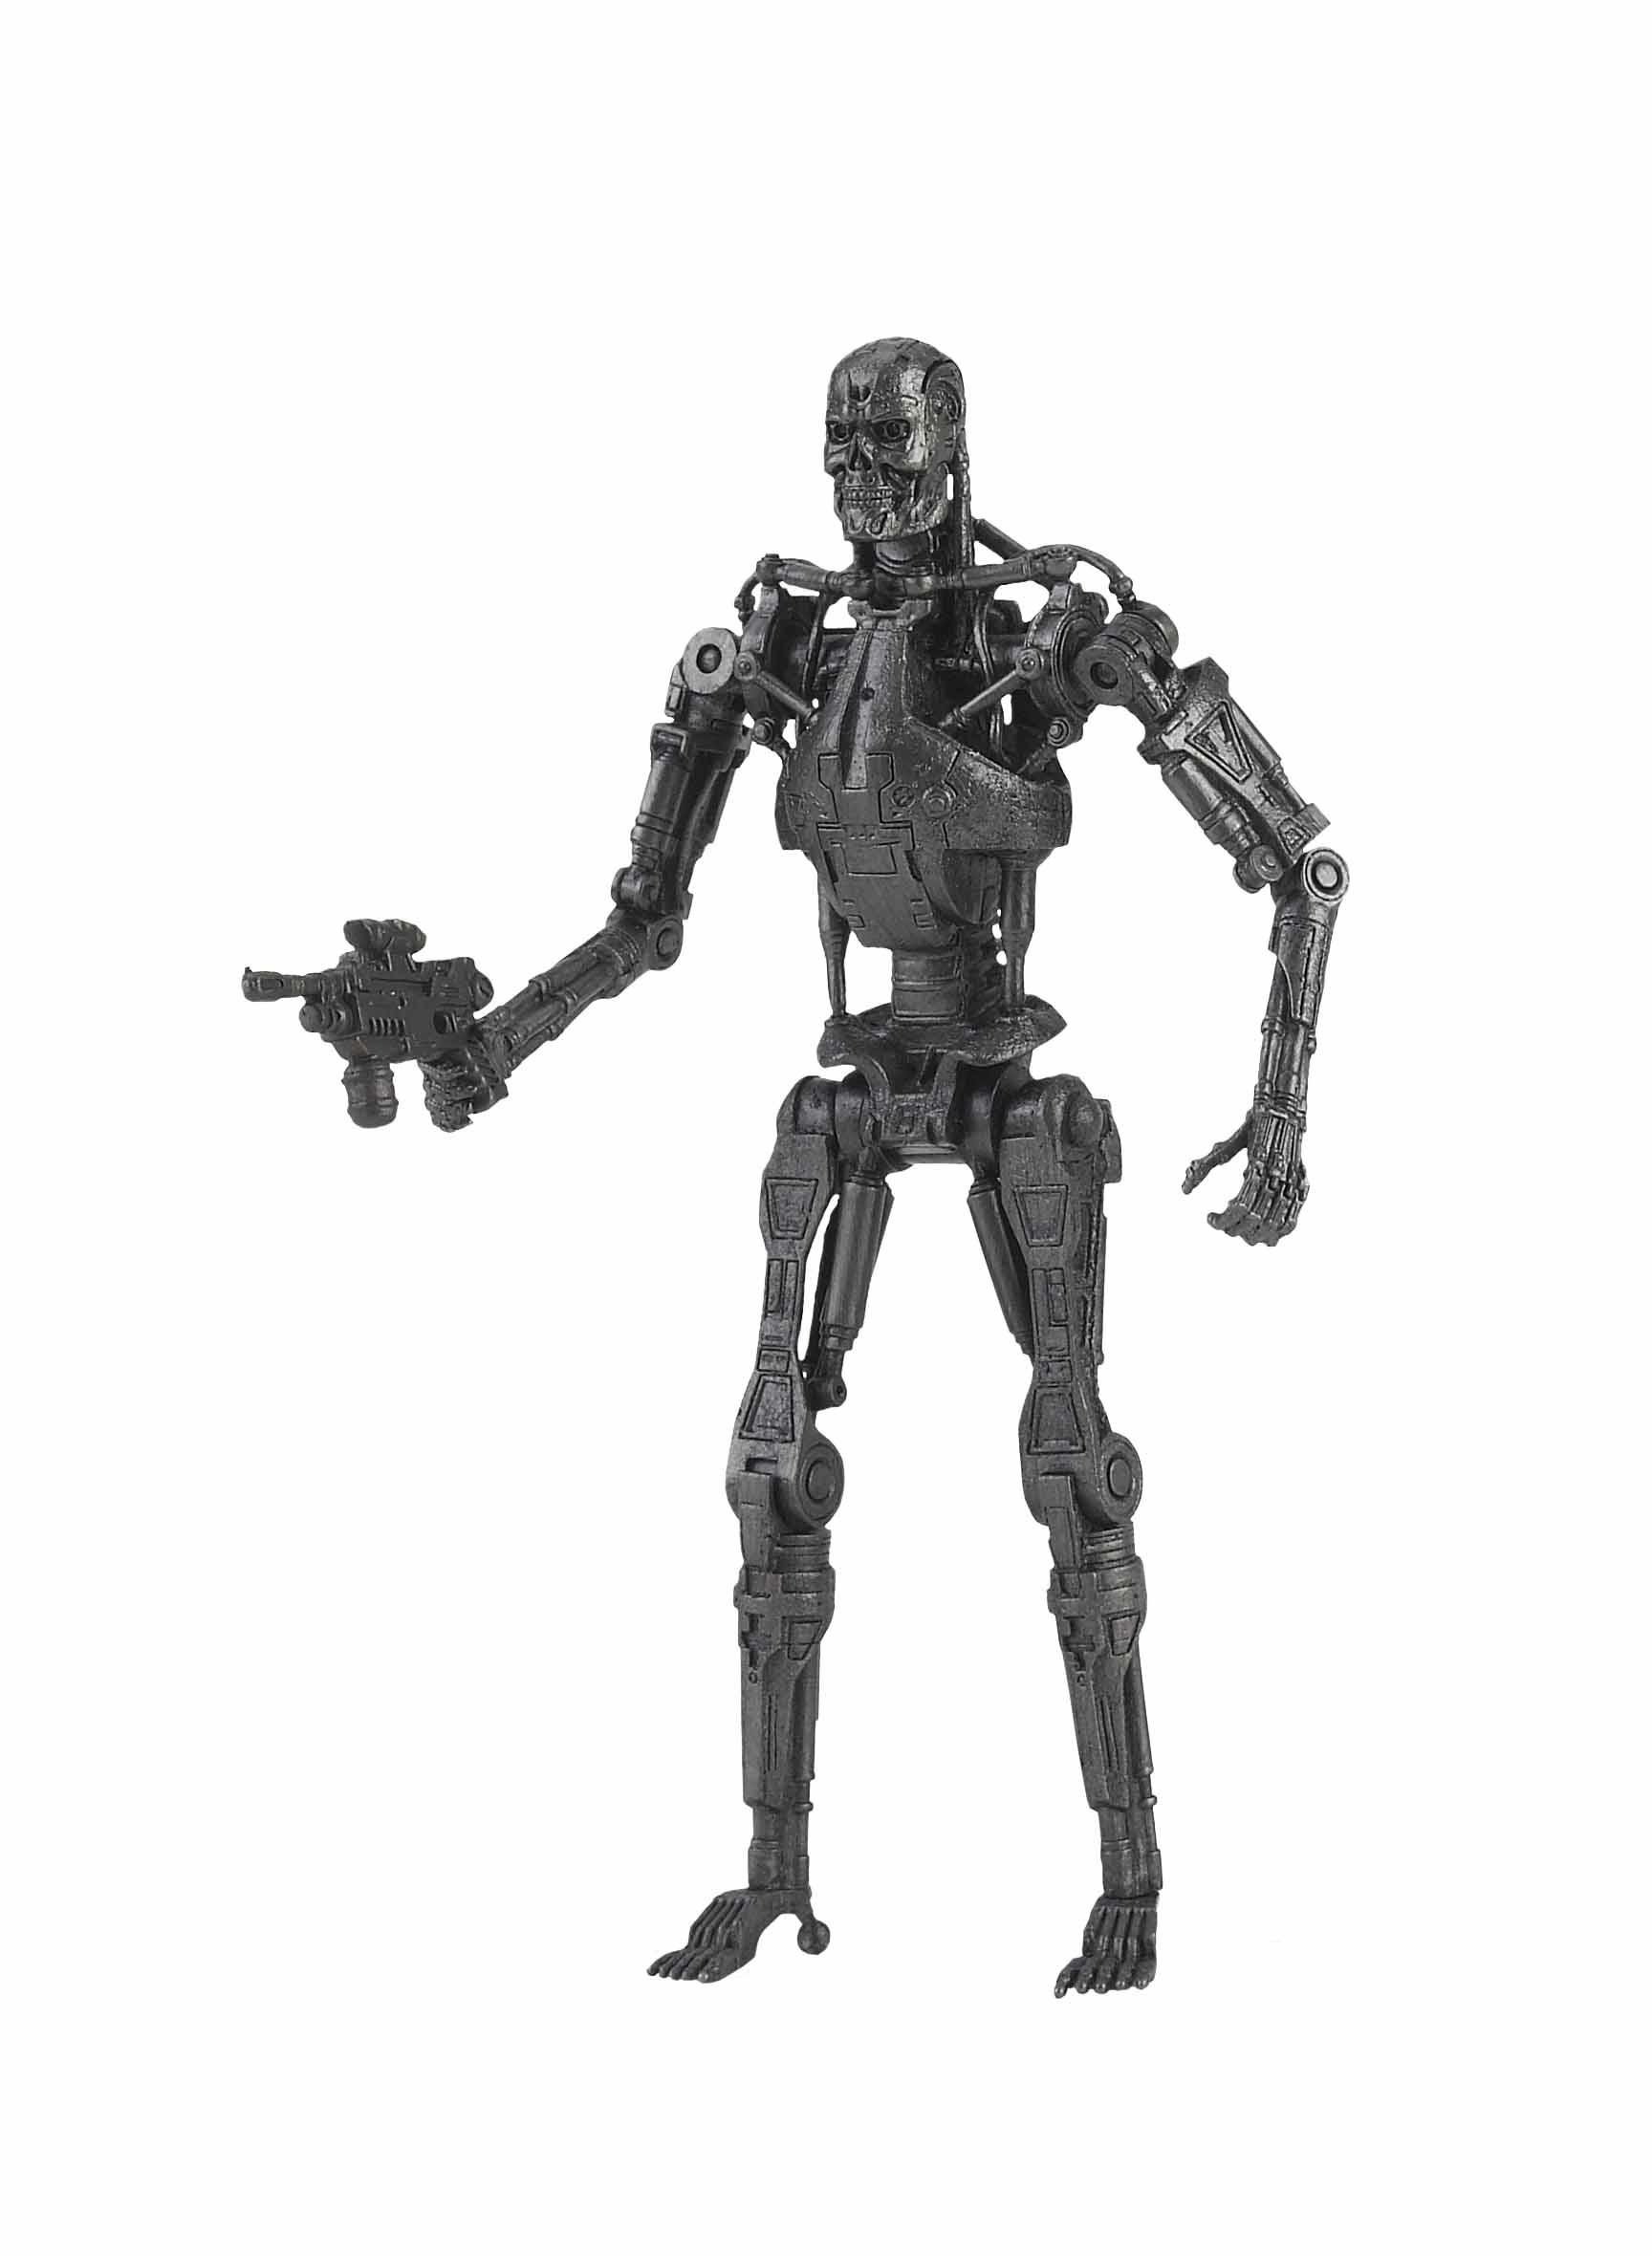 Terminator Childs Toys